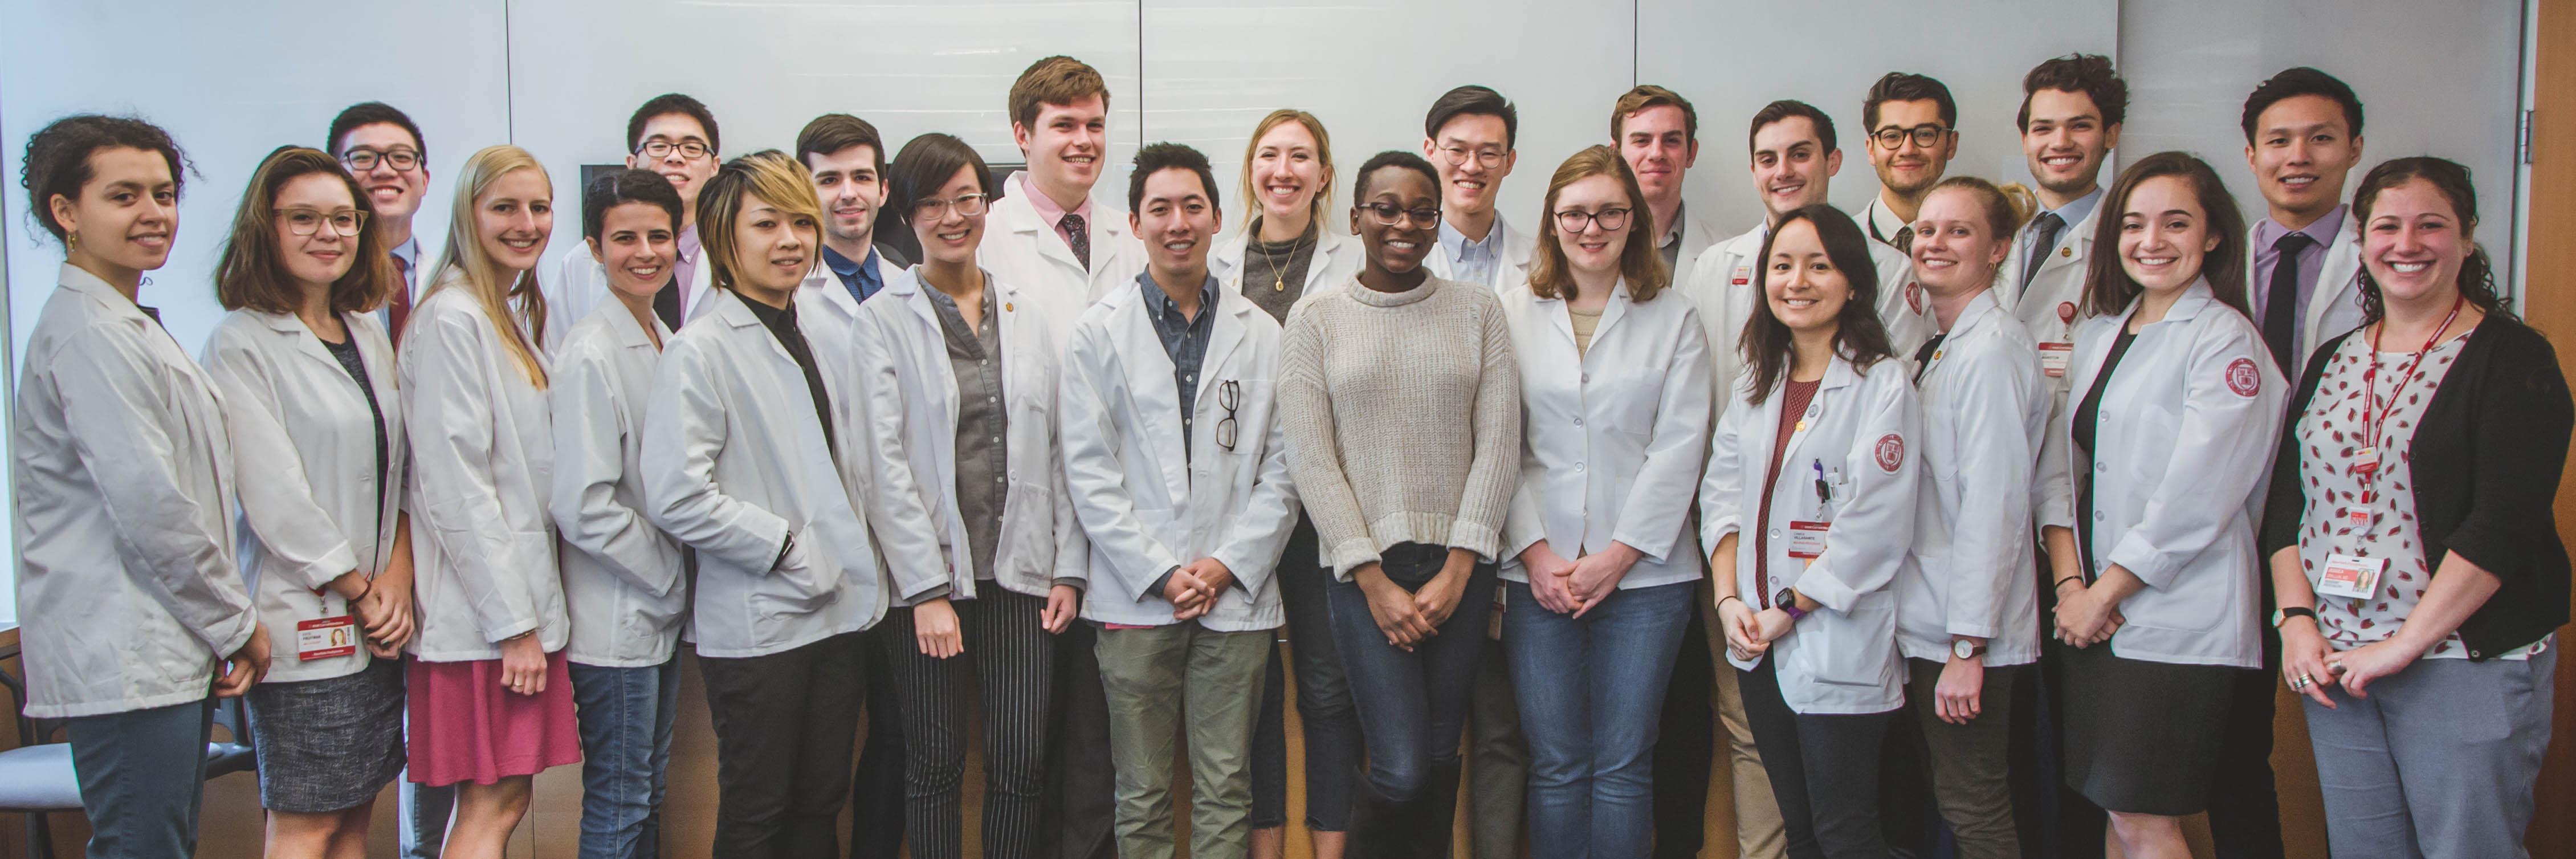 Weill Cornell Medicine Wellness Qlinic Staff Volunteers